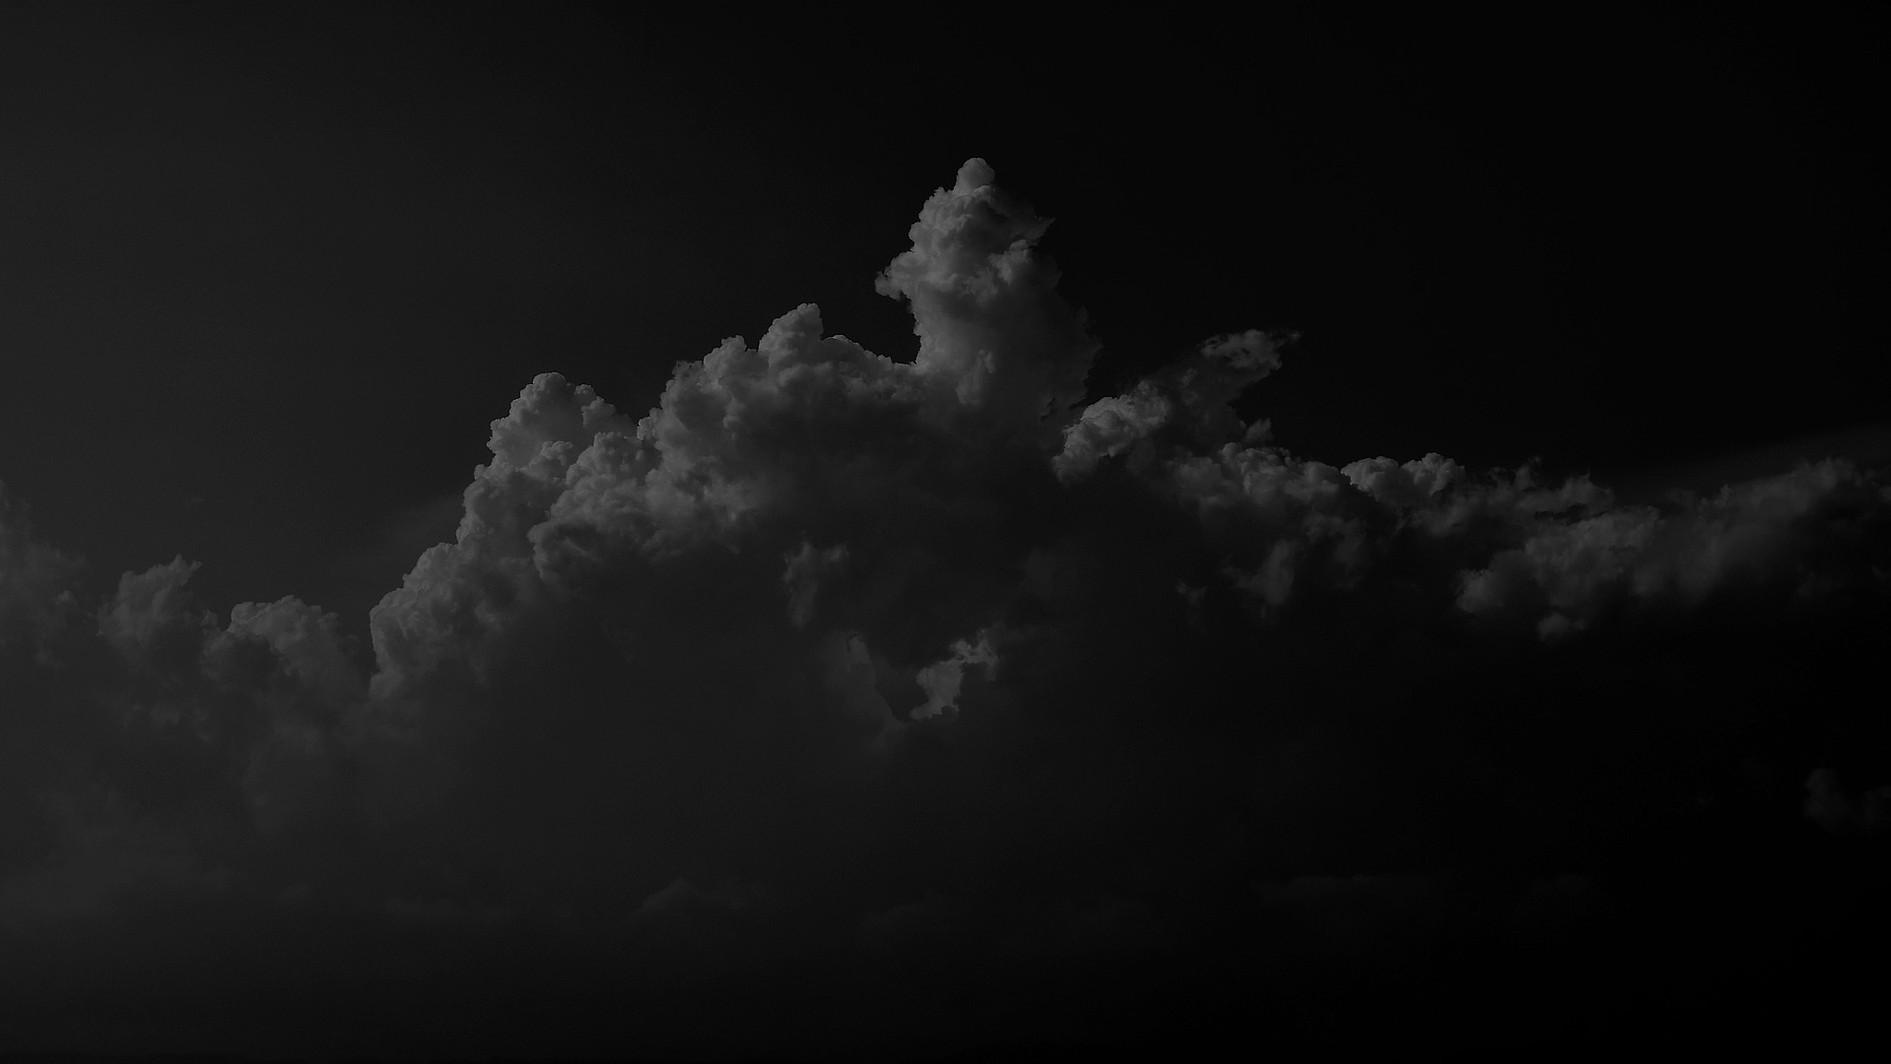 clouds-3407028_1920_edited_edited.jpg